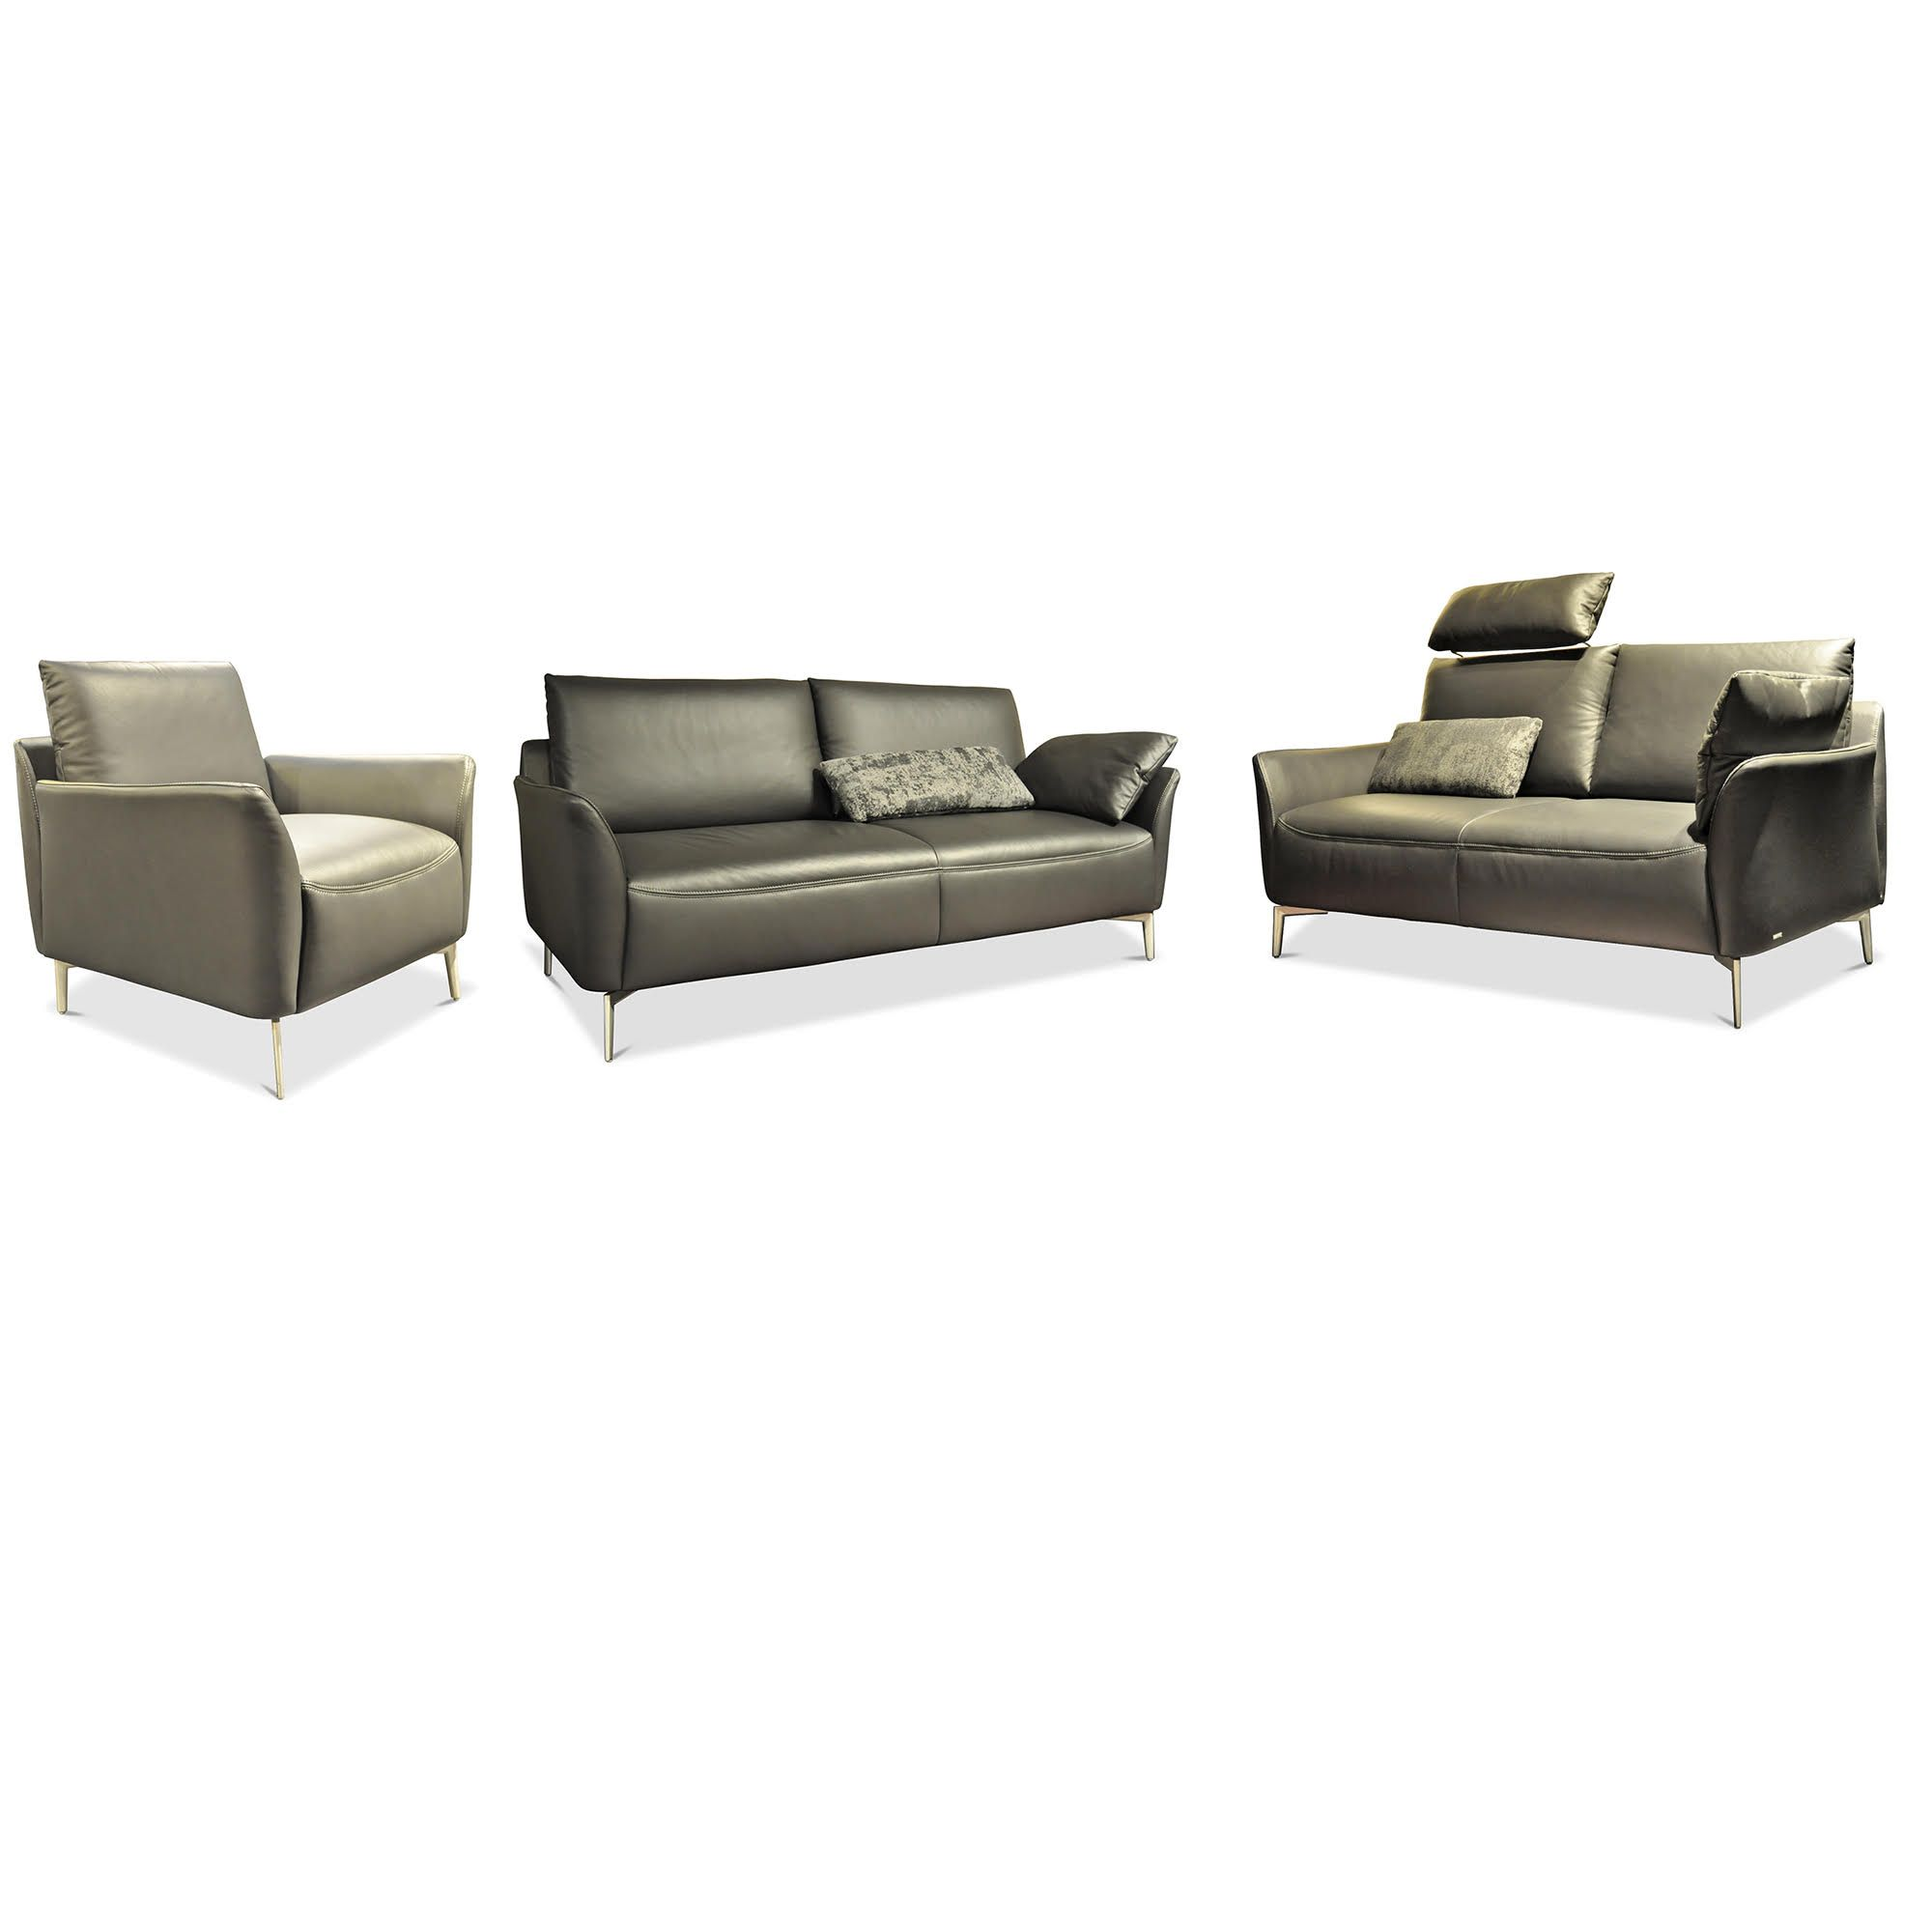 Garnitur Farina 2 5 Sitzer 2 Sitzer Sessel – Koinor – Sofas